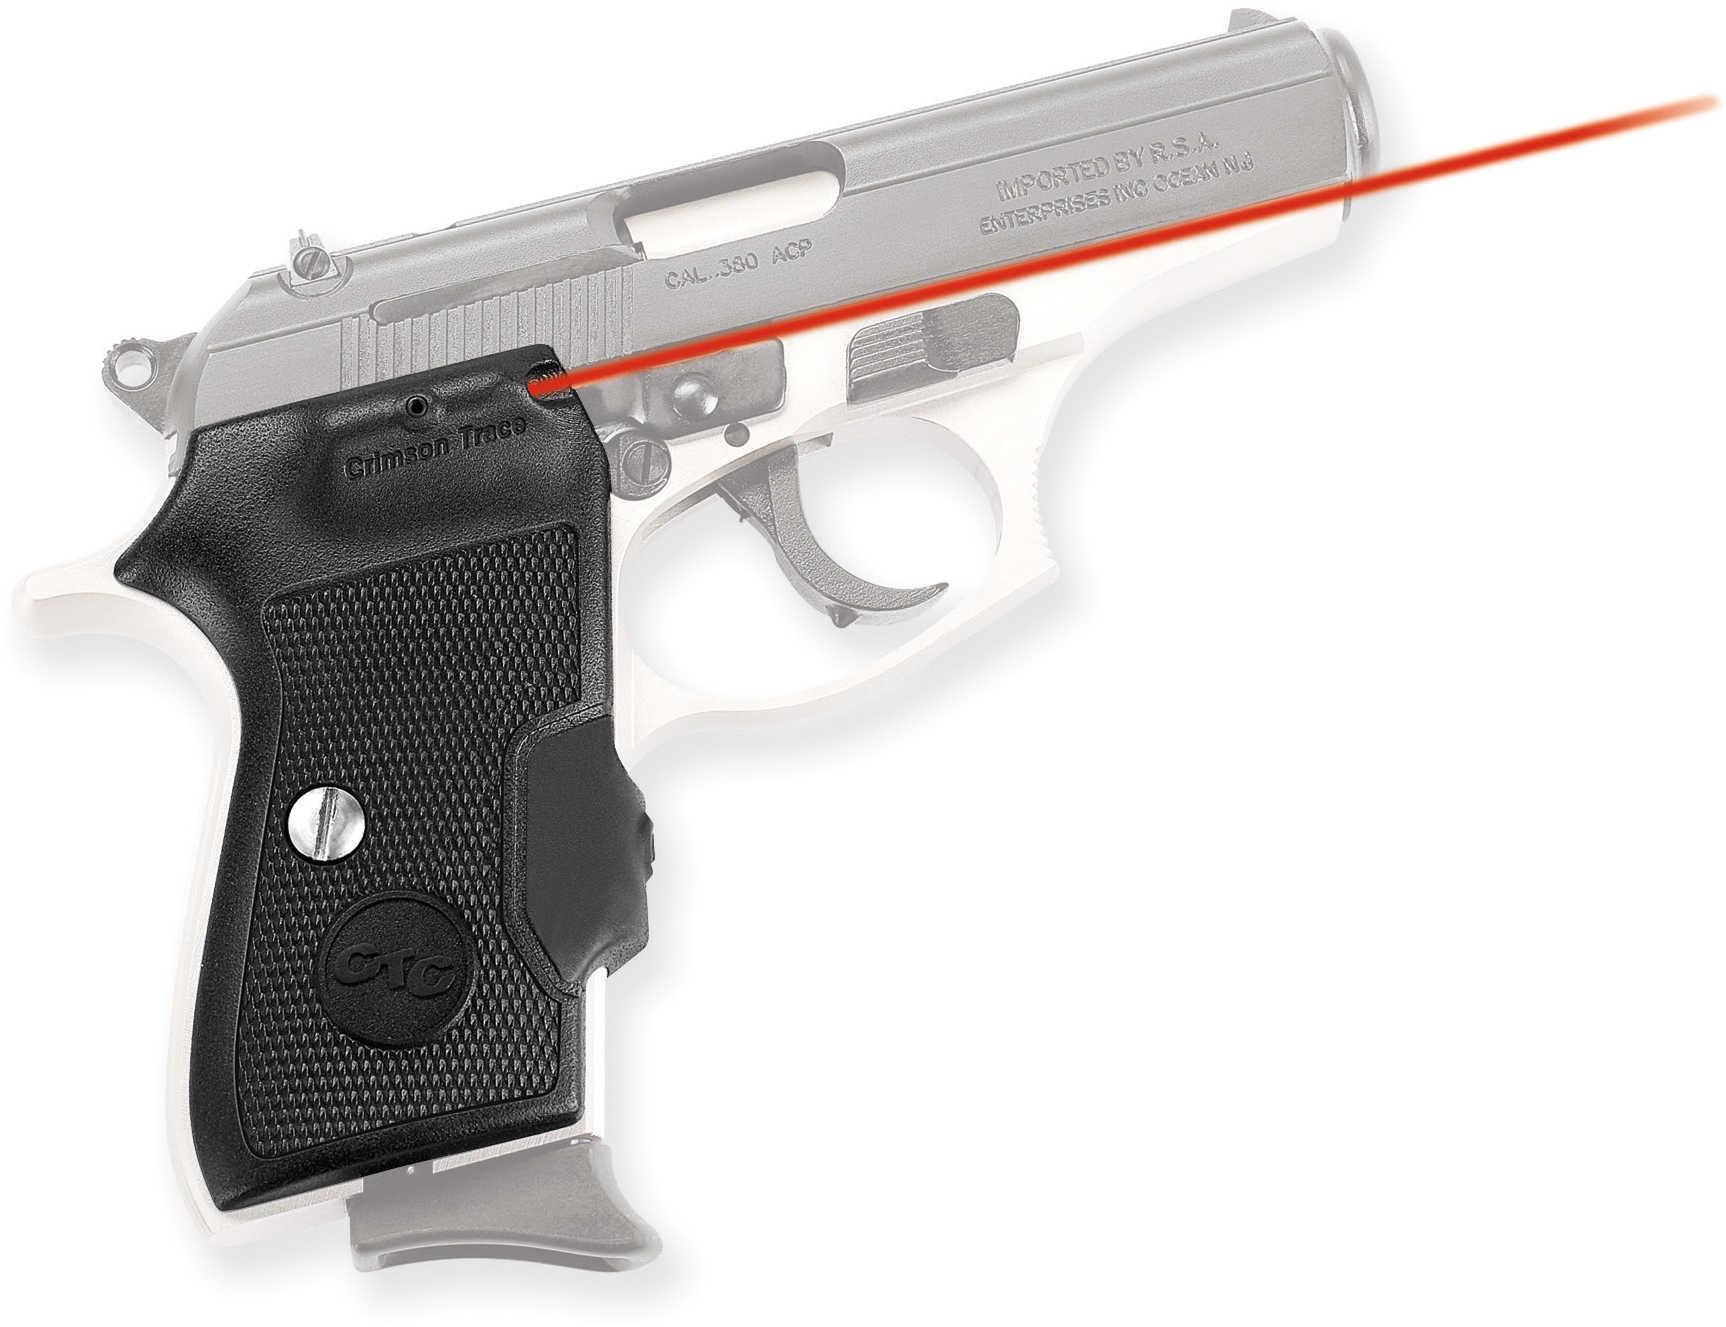 CTC Laser LASERGRIP Red Bersa Thunder/Firestorm 380